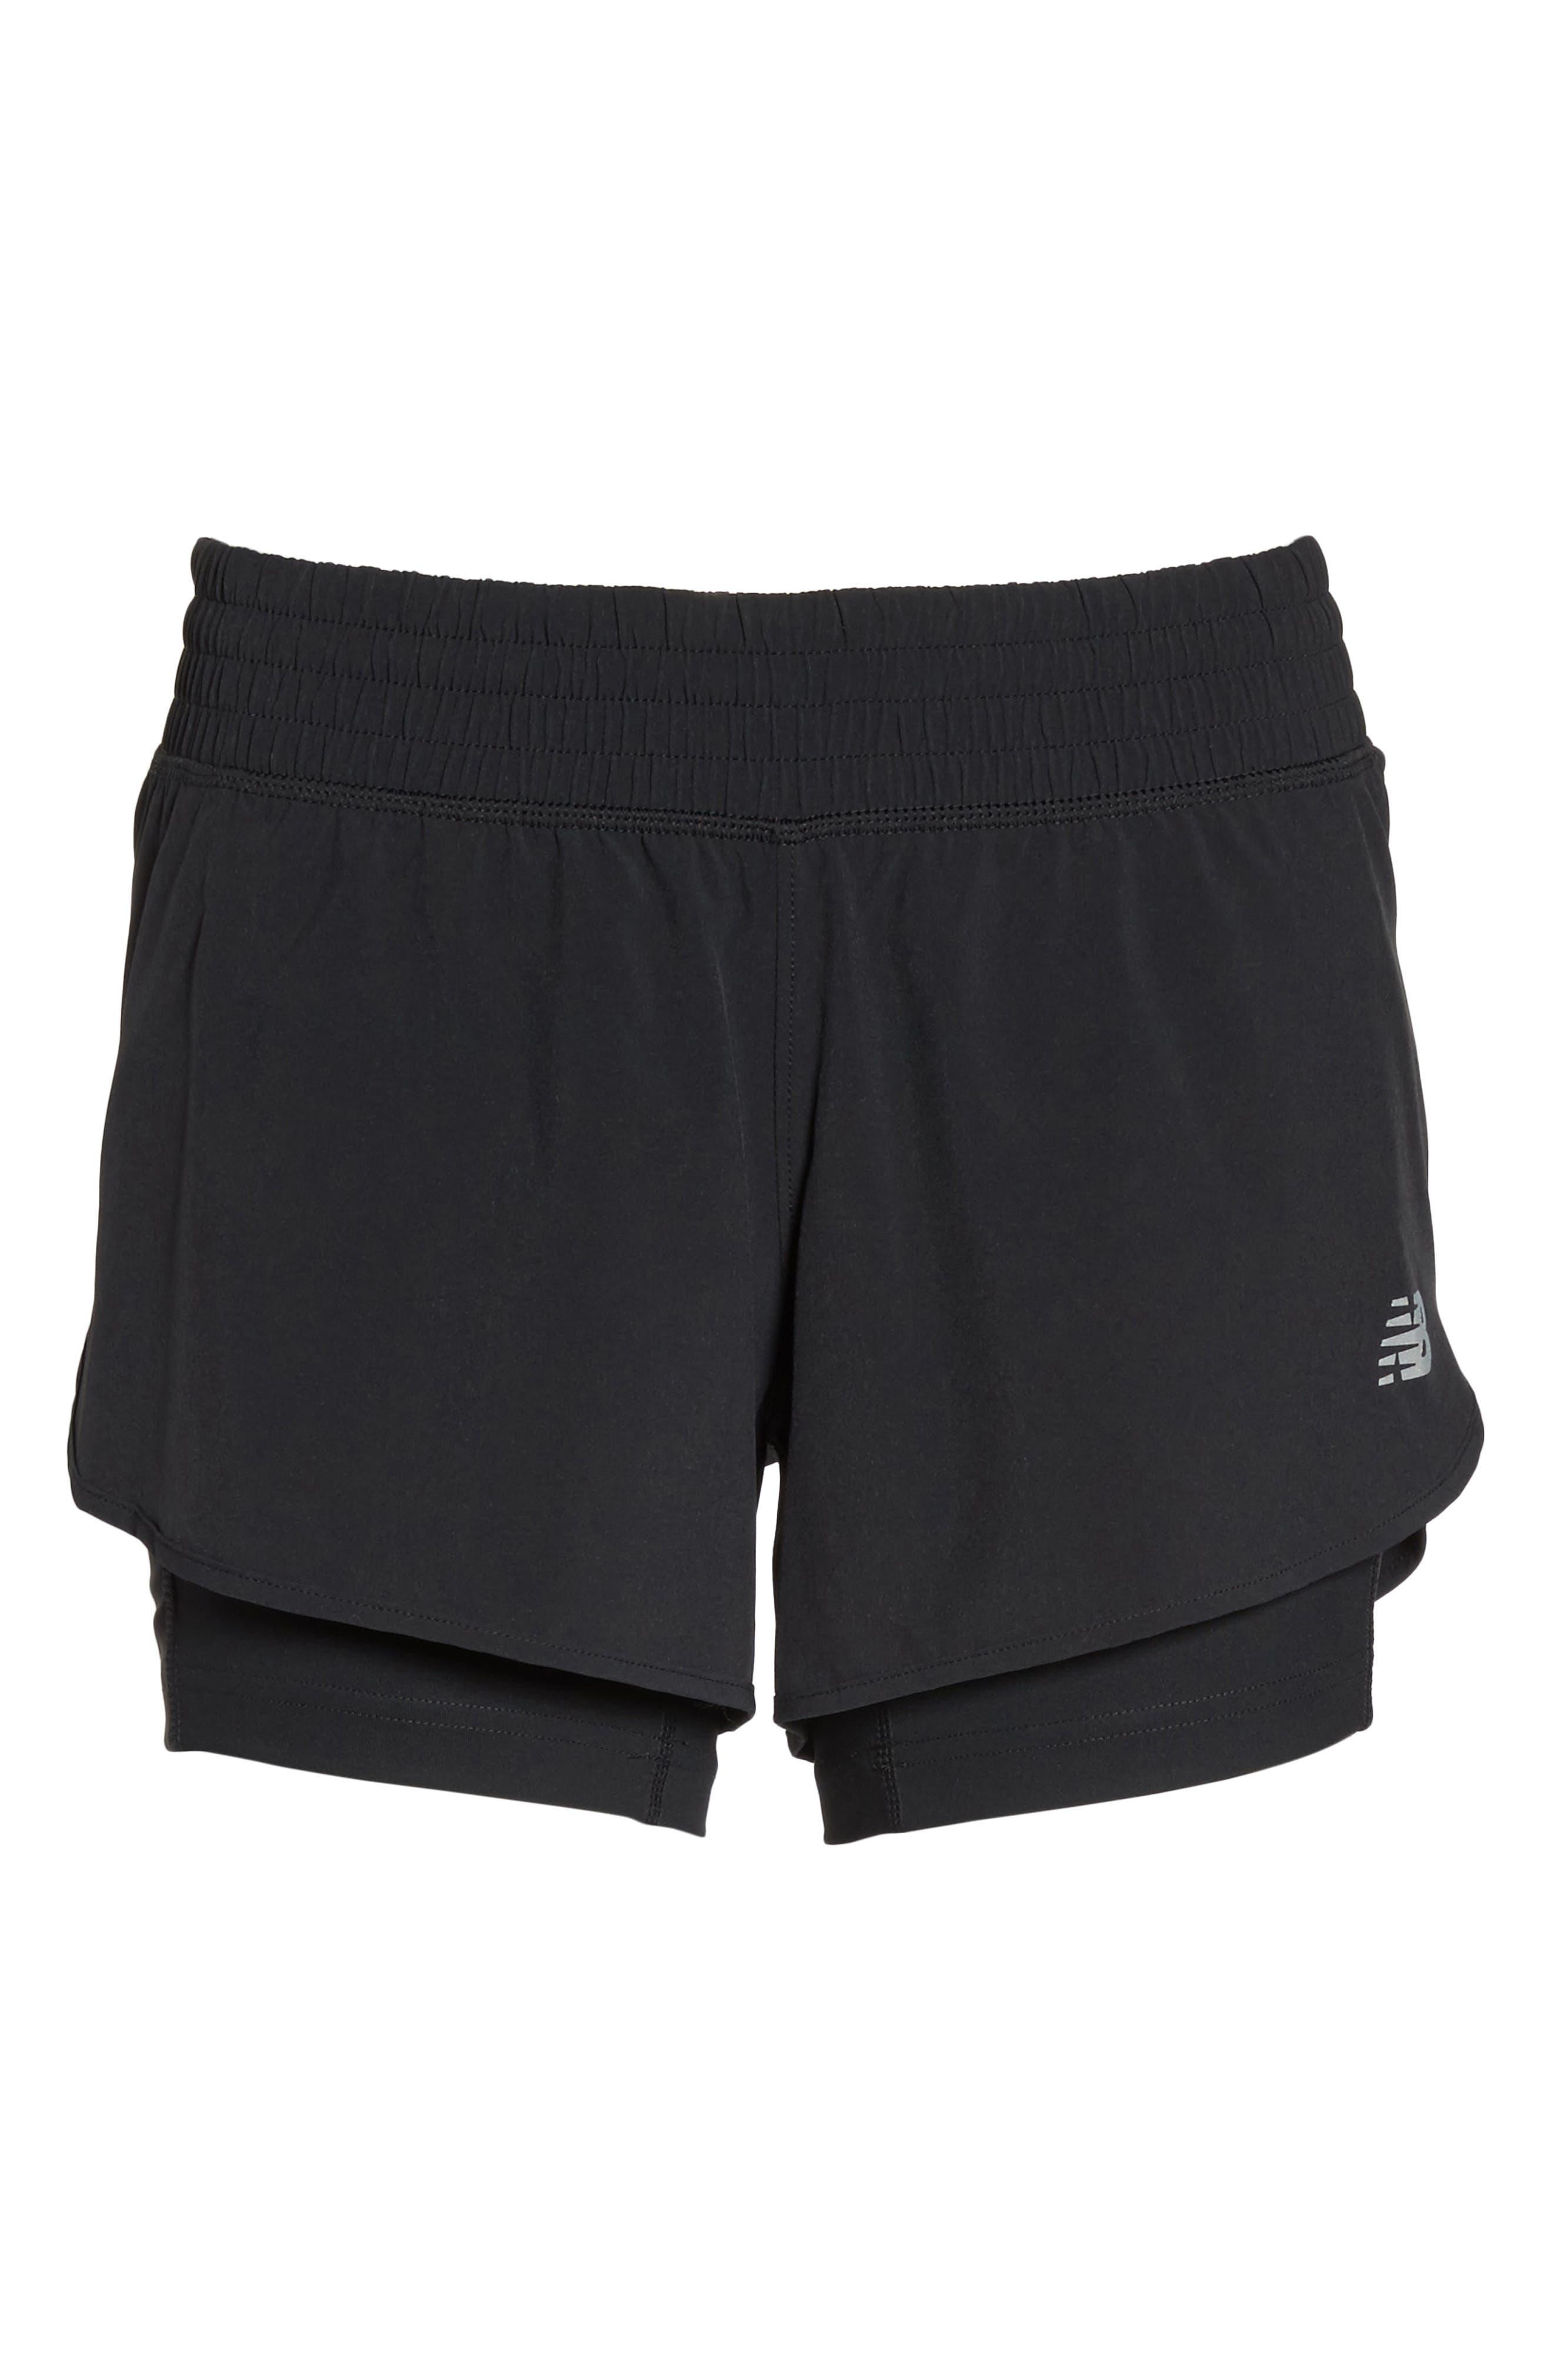 Impact Layered Running Shorts,                             Alternate thumbnail 7, color,                             Black